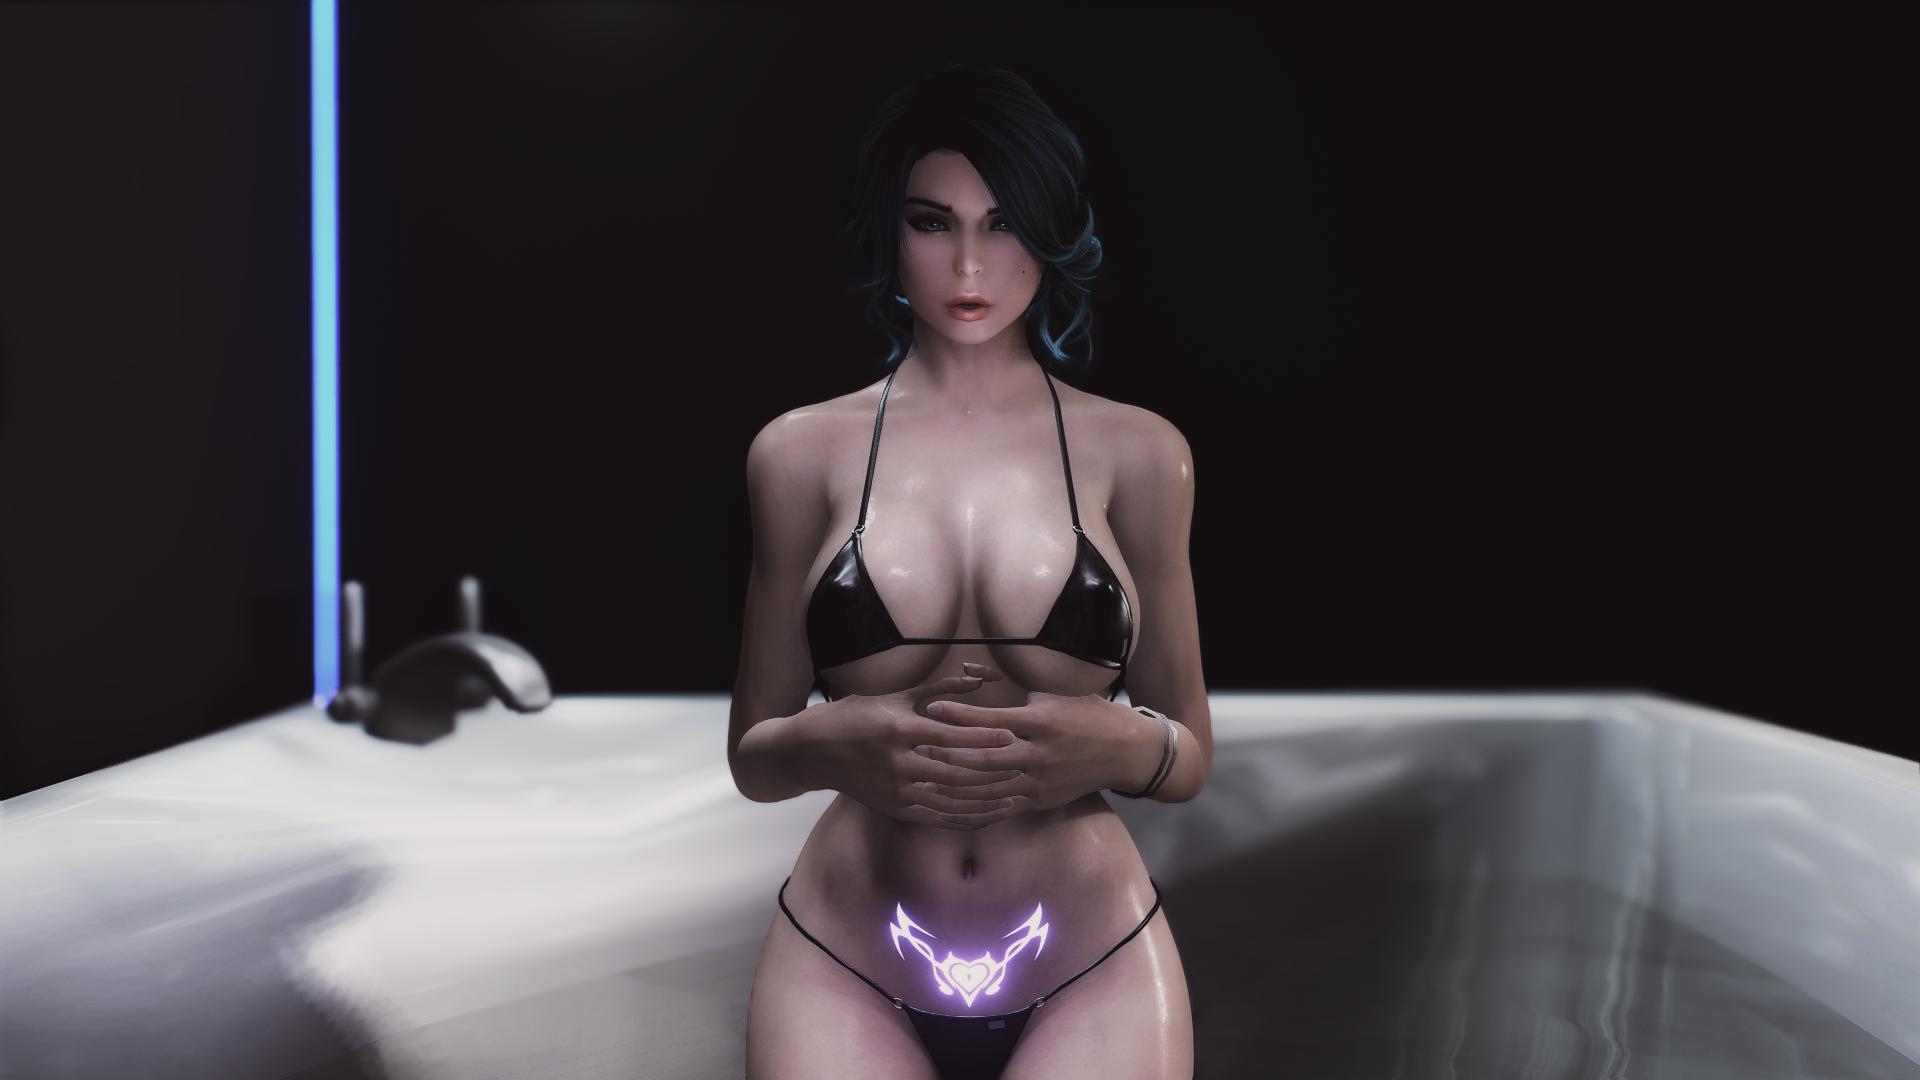 The_Elder_Scrolls_V_Skyrim_Special_Edition_Screenshot_2020.09.12_-_17.57.45.40.png